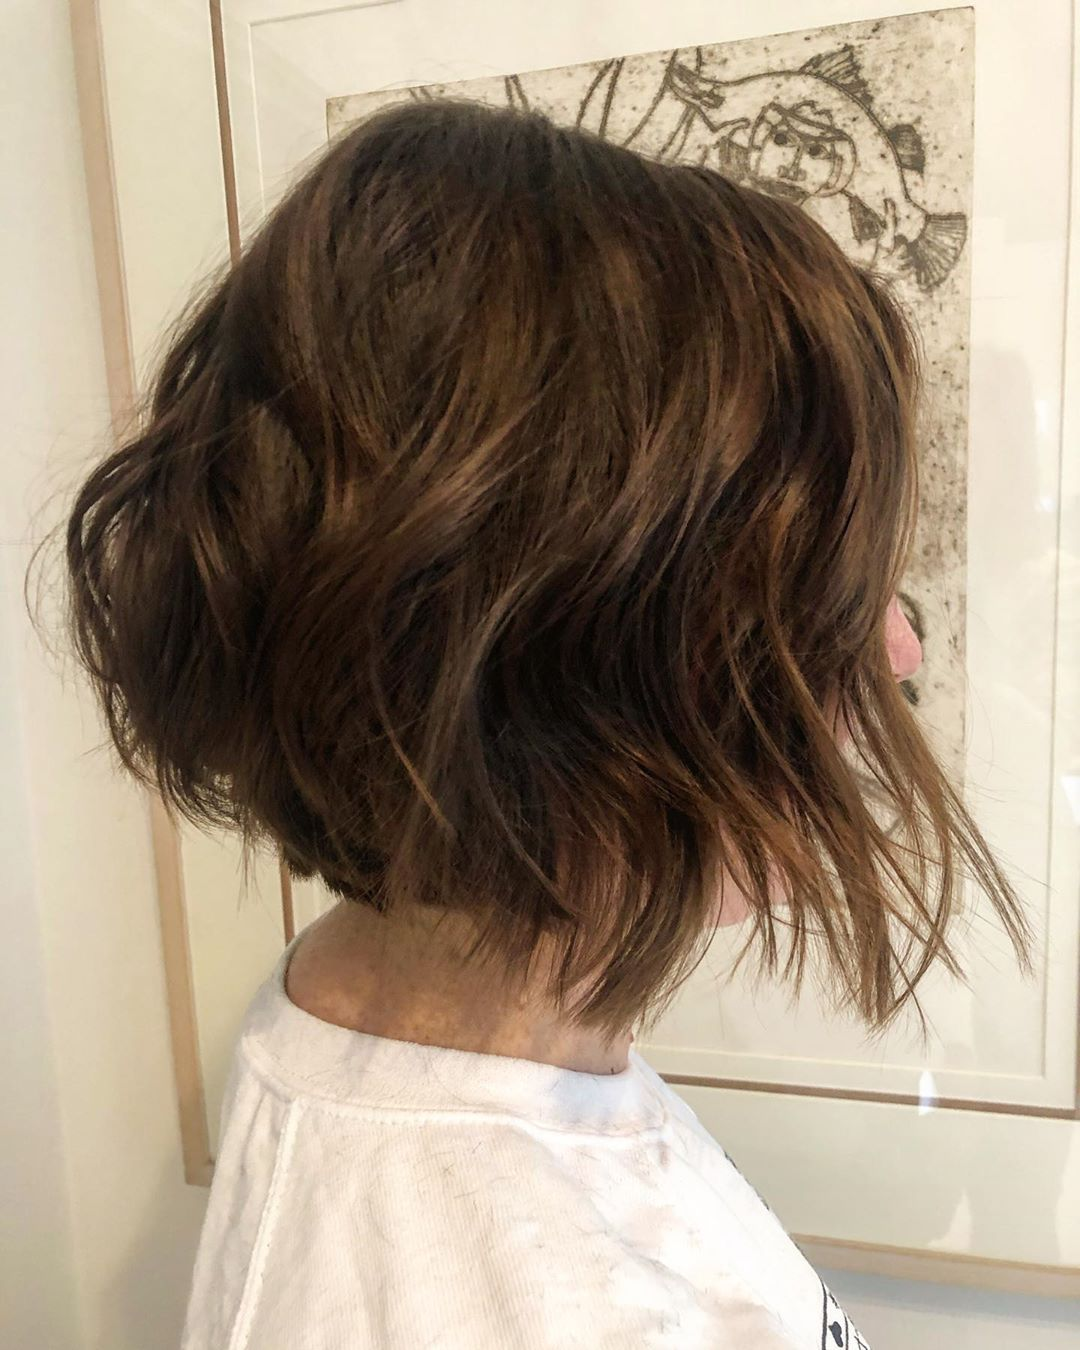 30 Low Key Short Wedding Hairstyles Of Summer 2020